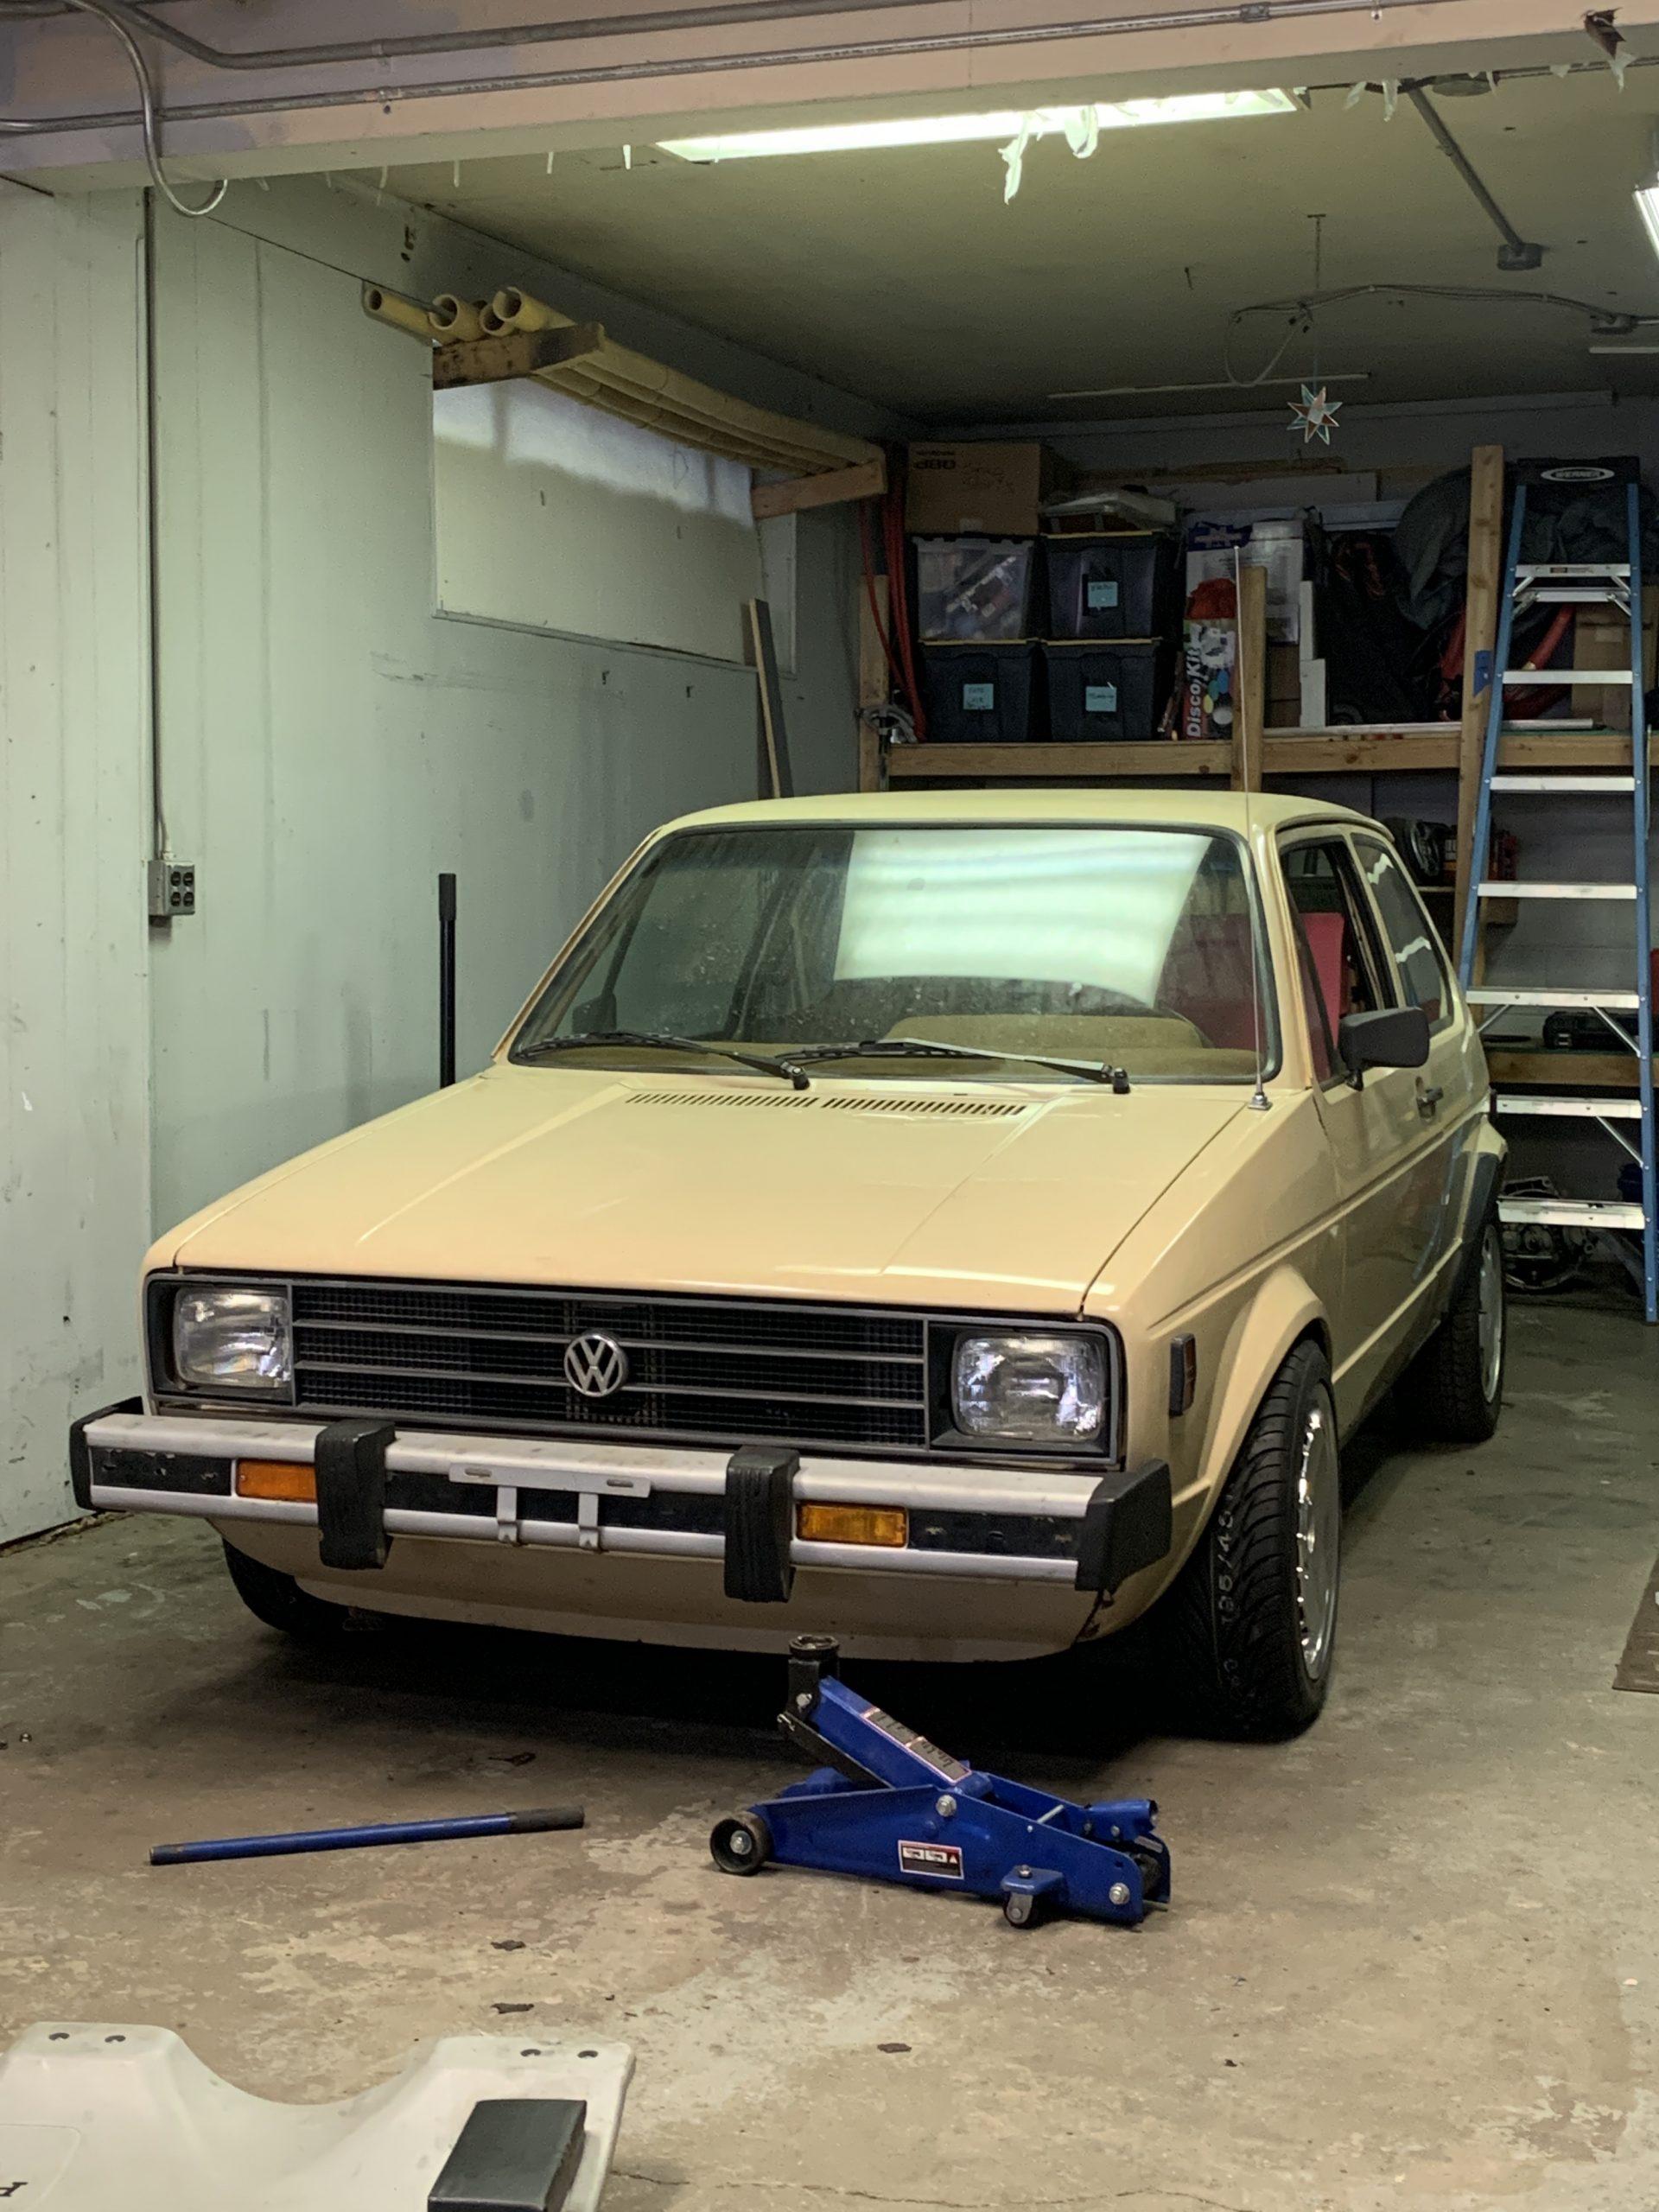 1980 VW Rabbit TDI swap front Aug 31, 5 09 56 PM